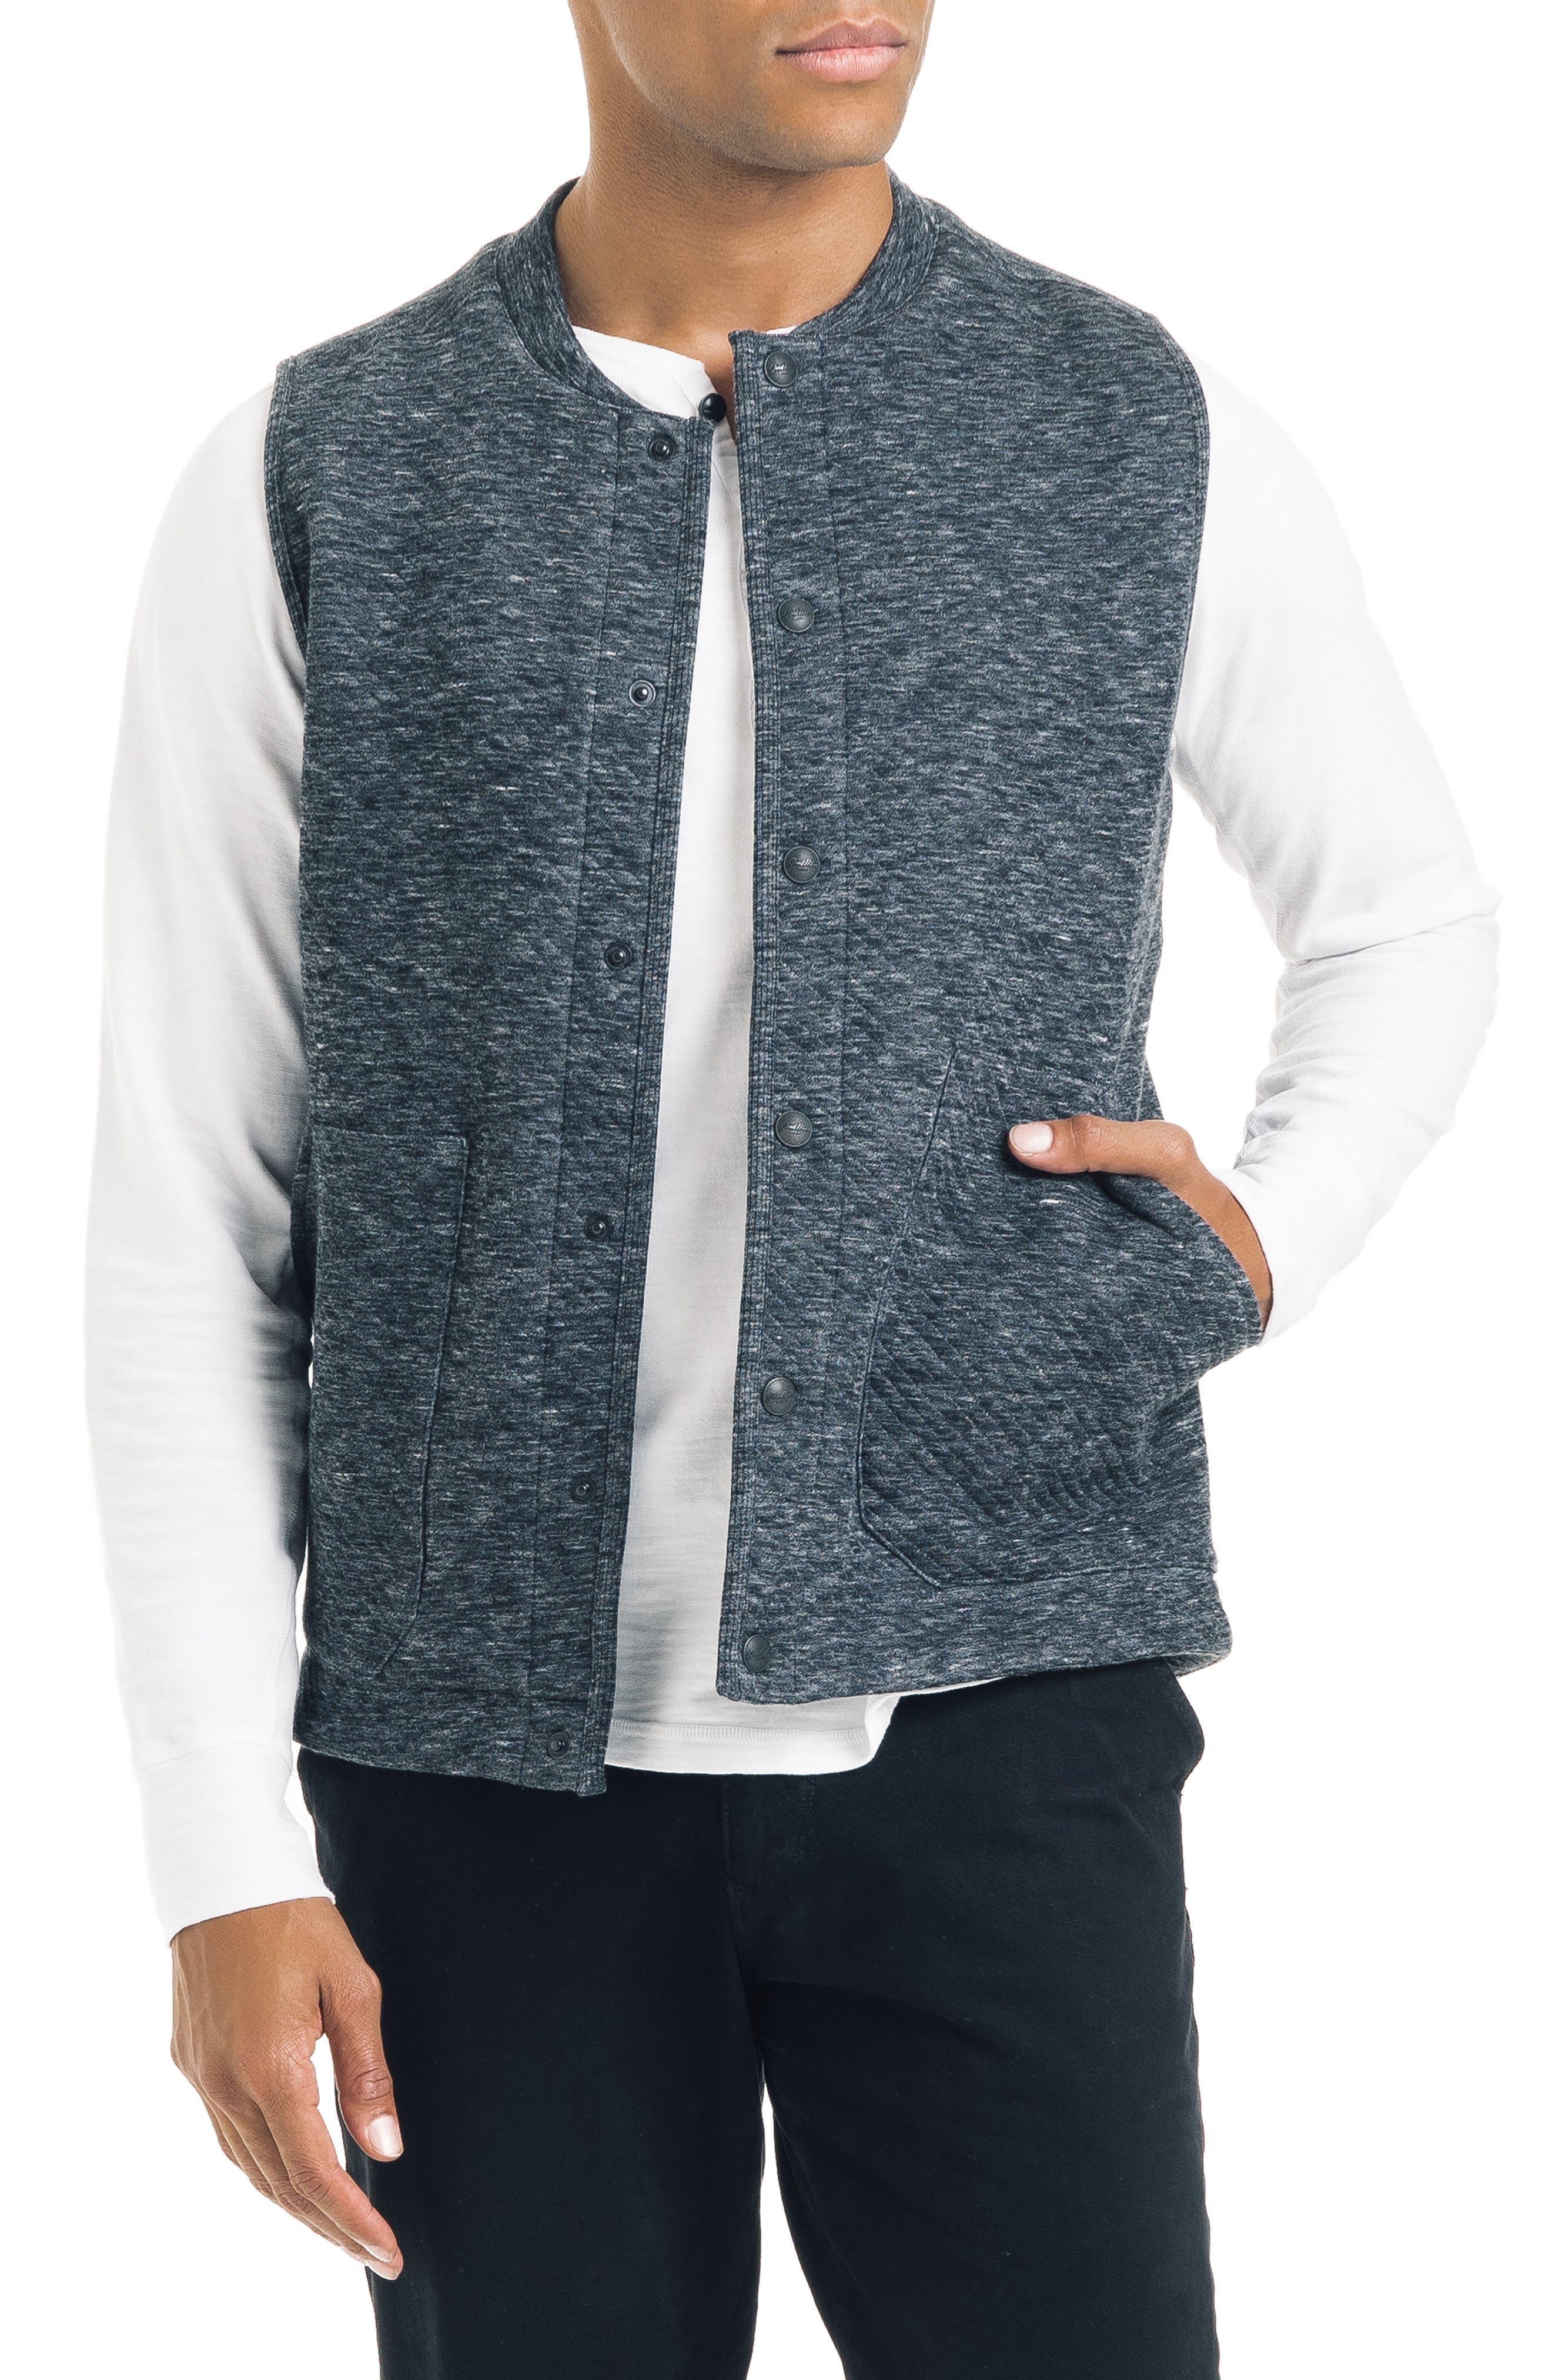 Good Man Brand Slim Fit Vest, Grey